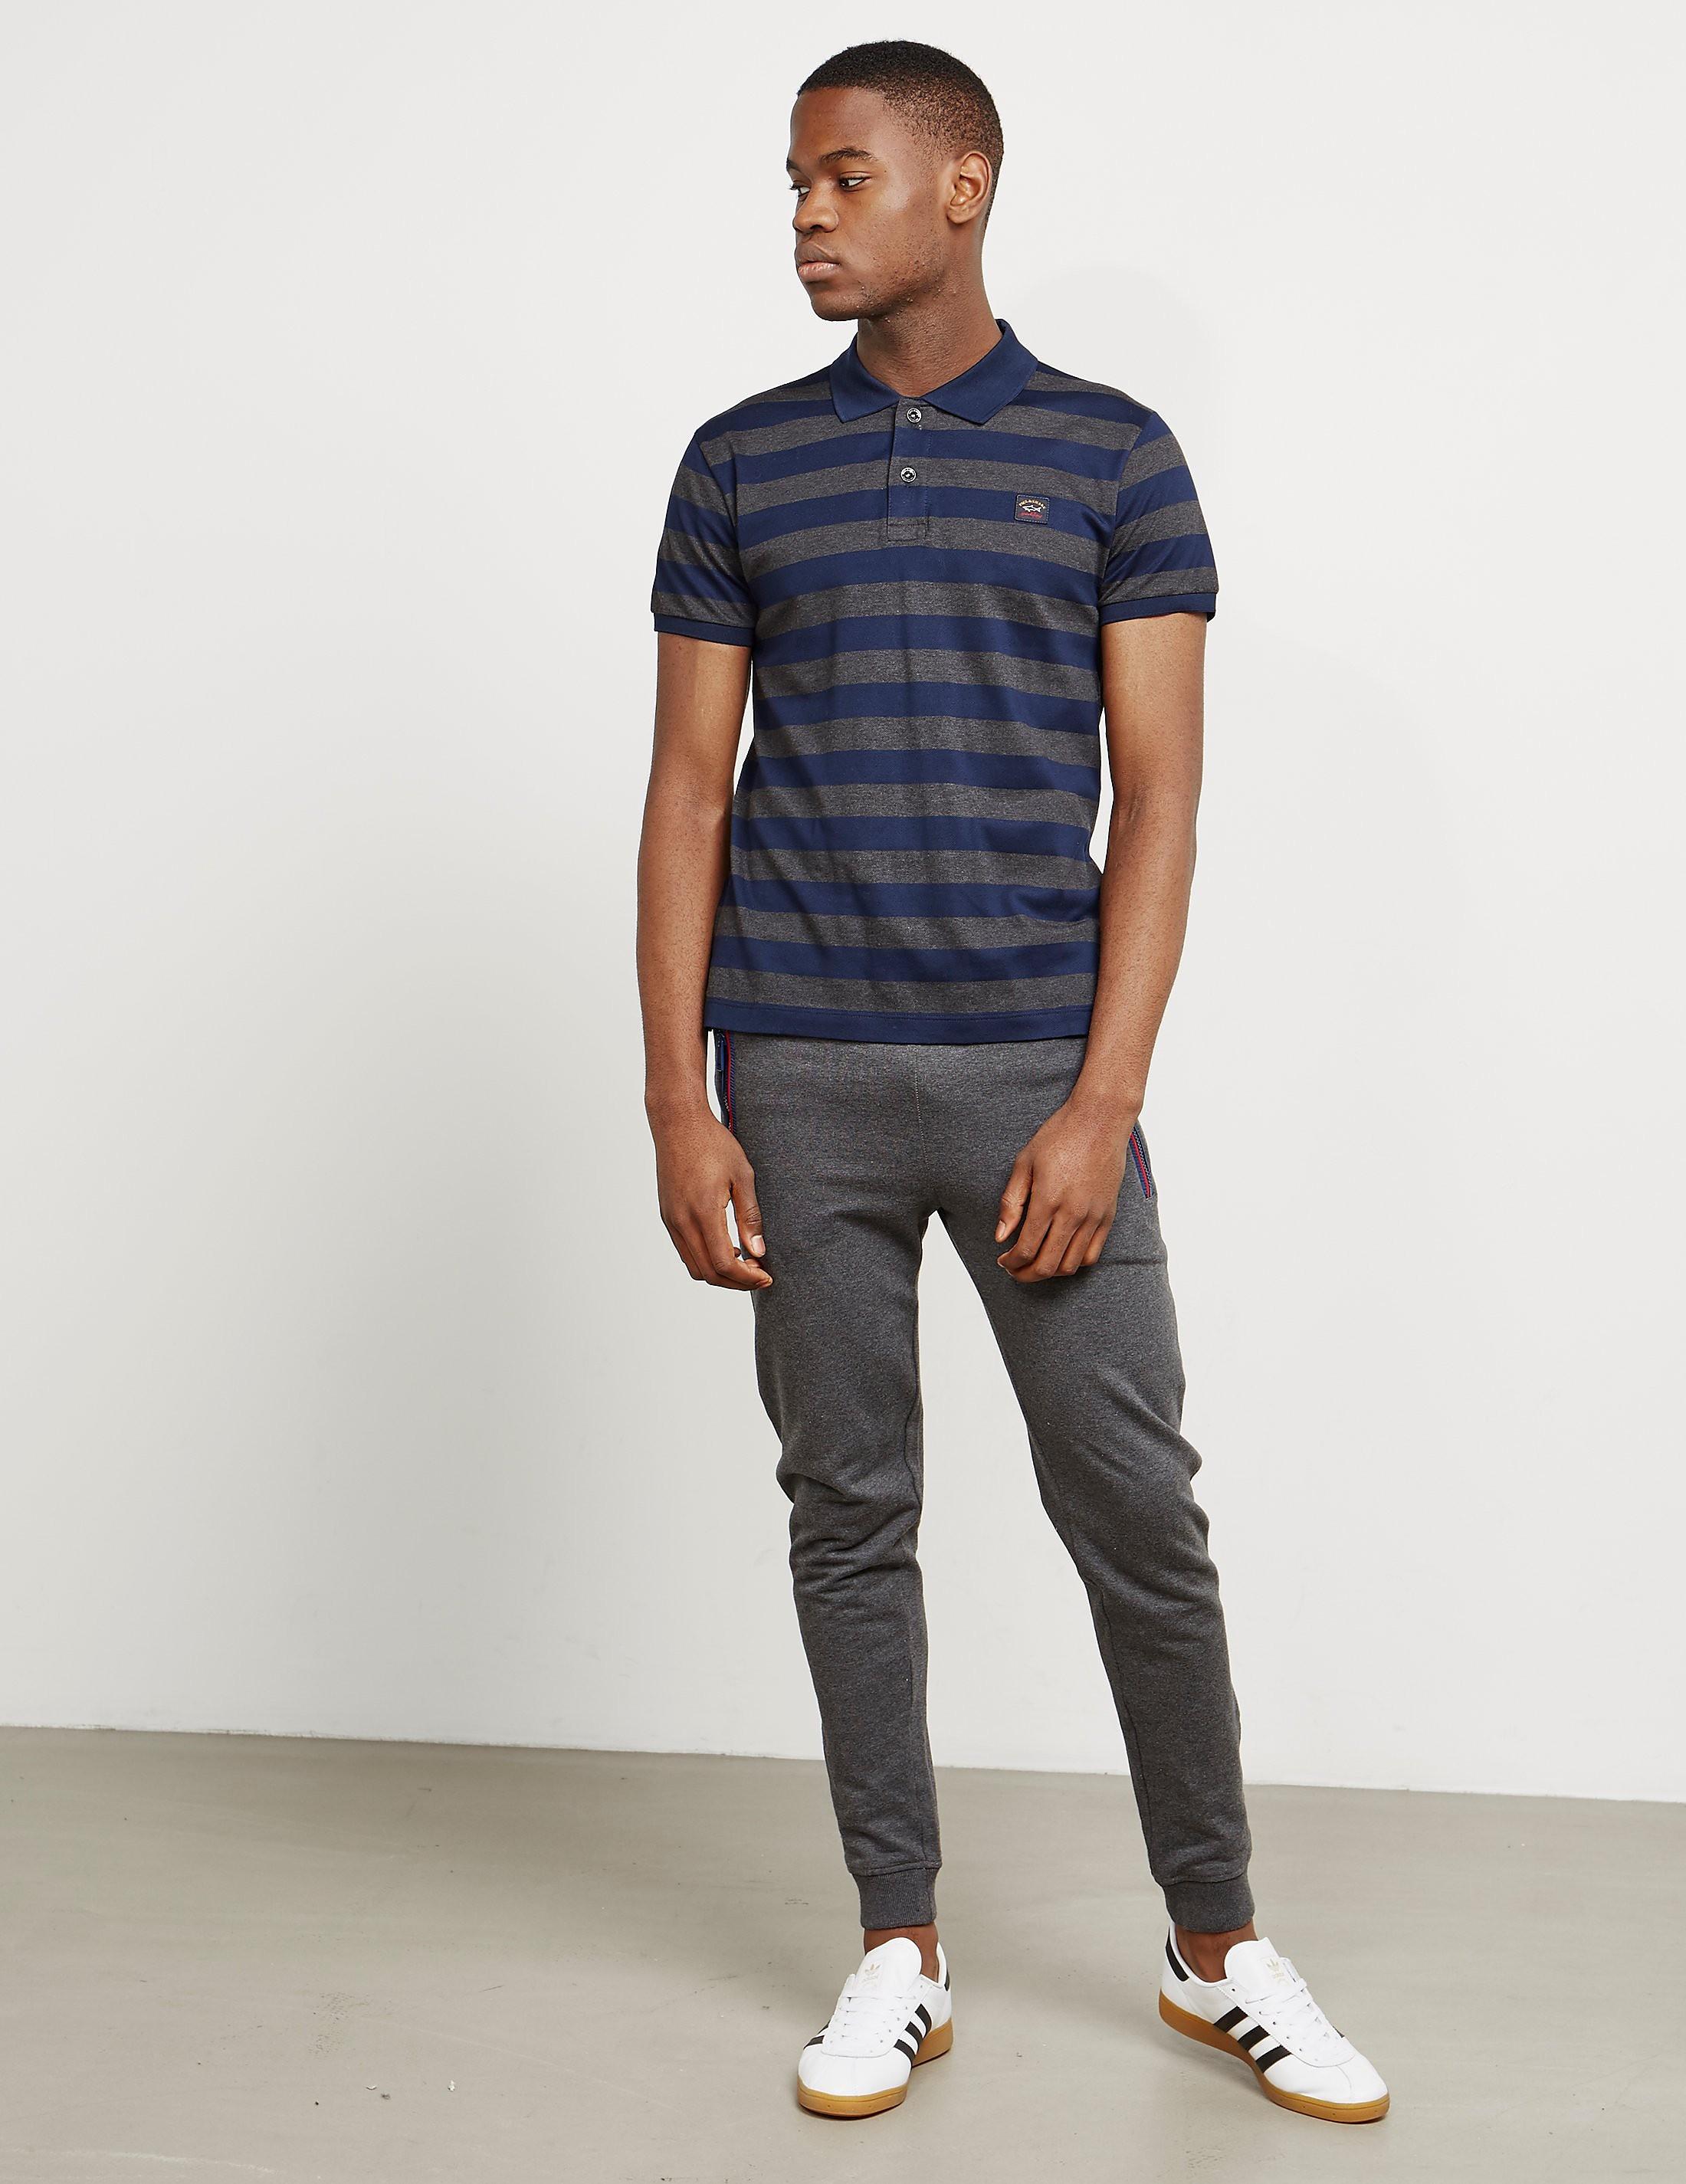 Paul and Shark Pique Striped Short Sleeve Polo Shirt